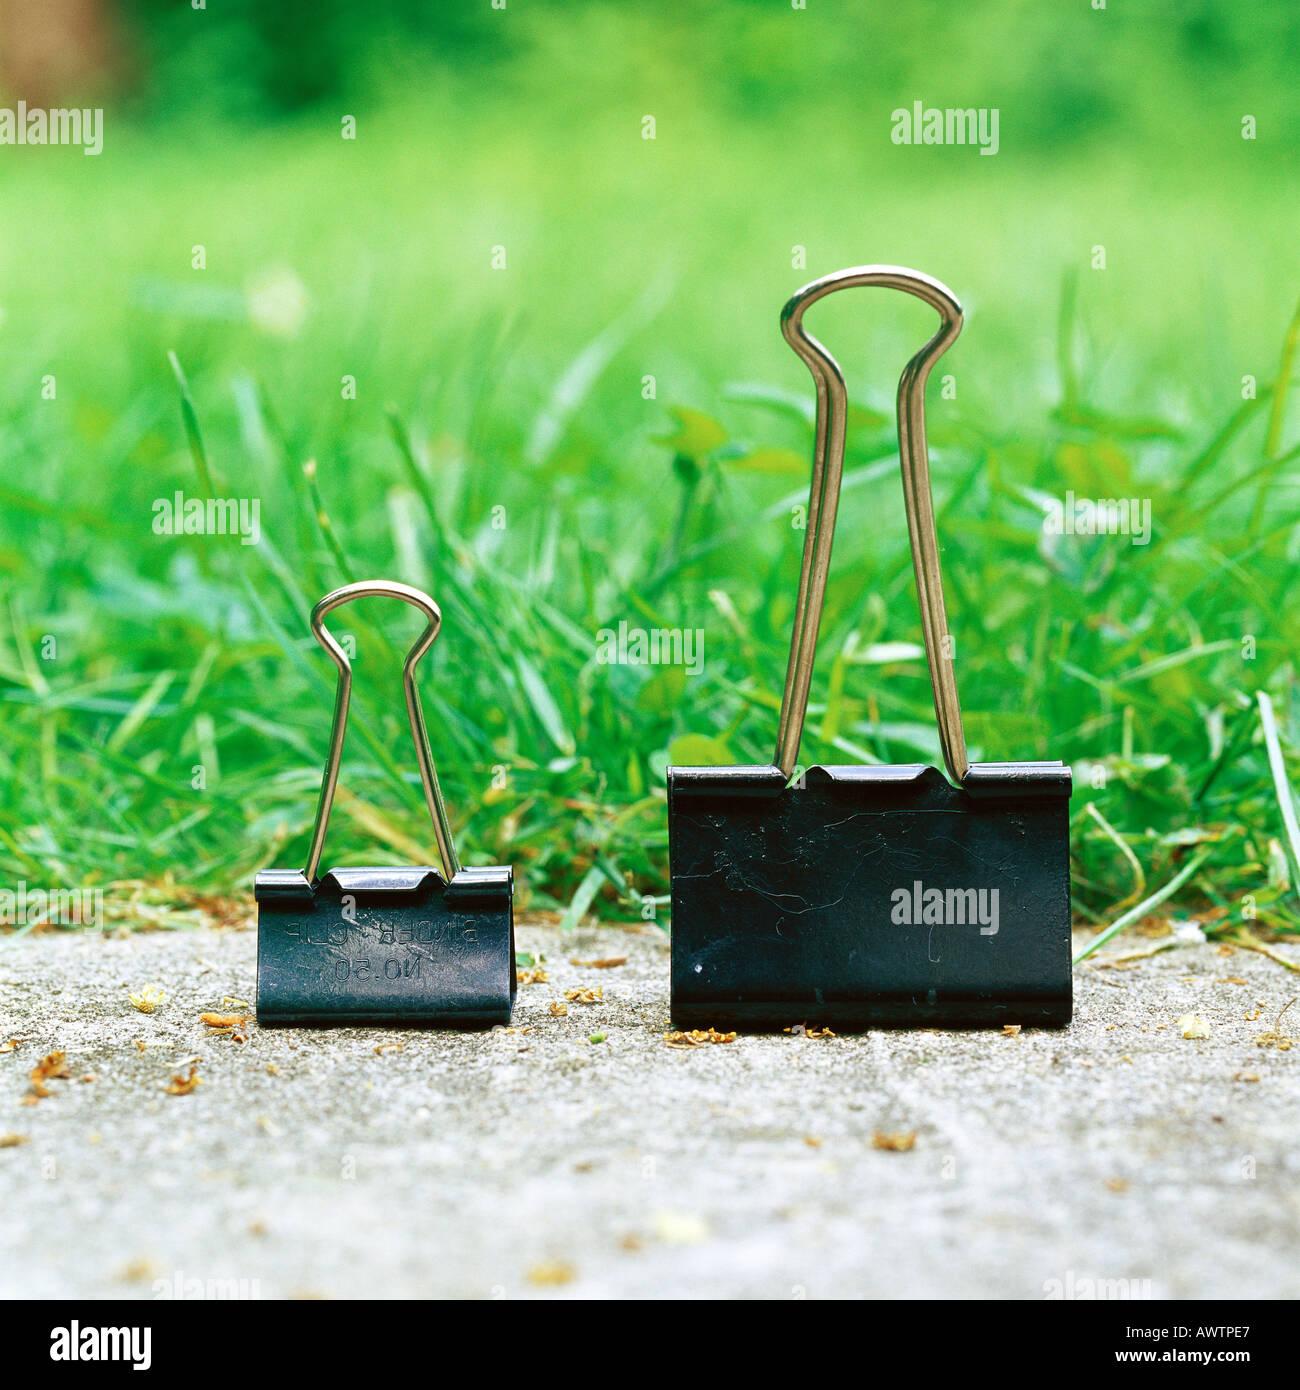 Binder clips on sidewalk - Stock Image